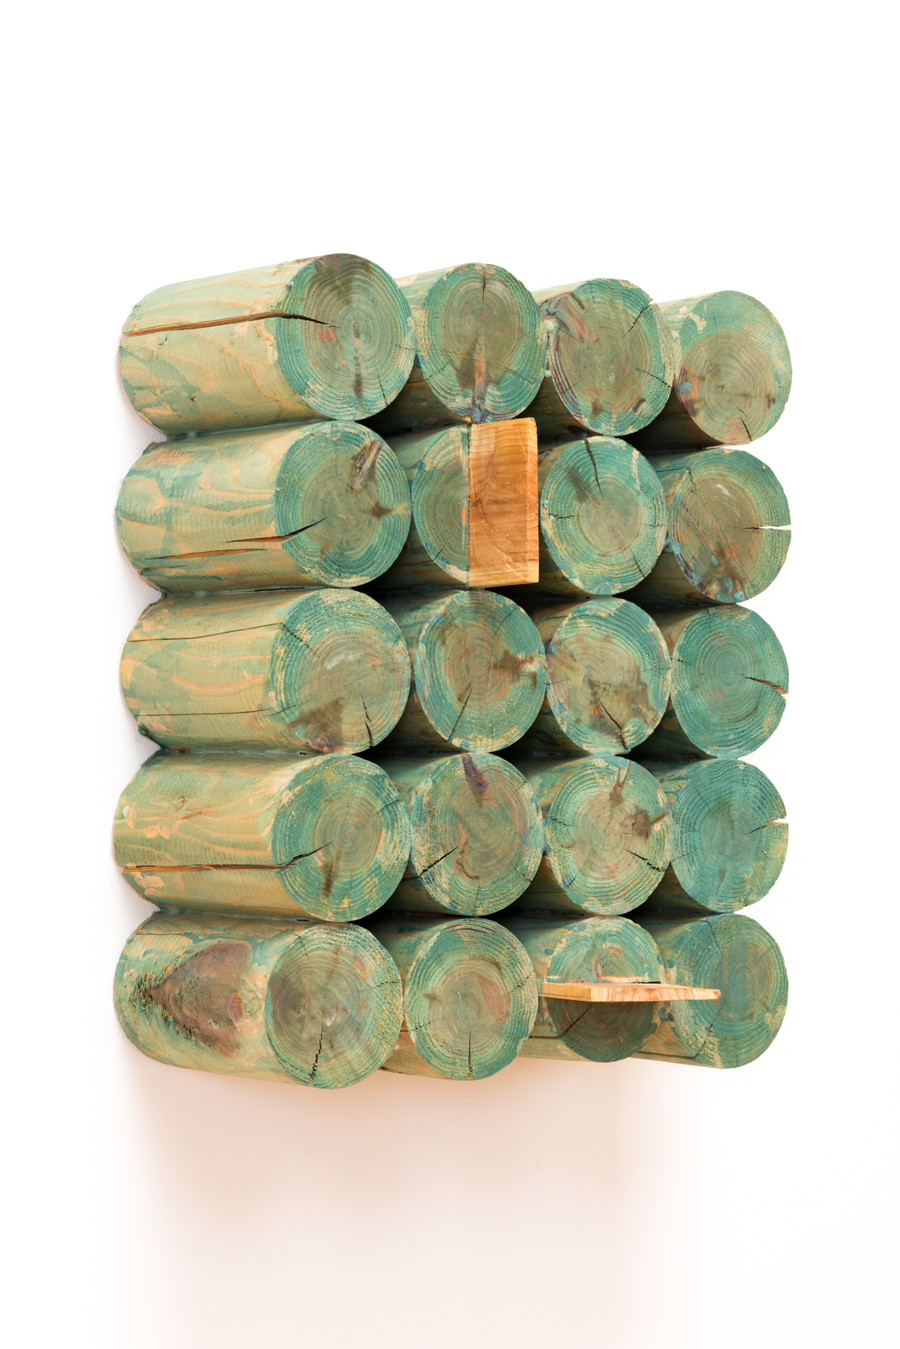 Scatterization , 2007 散分化 ( Sanbunka ) Wood, acrylic 15 15/16 x 12 3/4 x 7 7/8 inches 40.5 x 32.5 x 20 cm